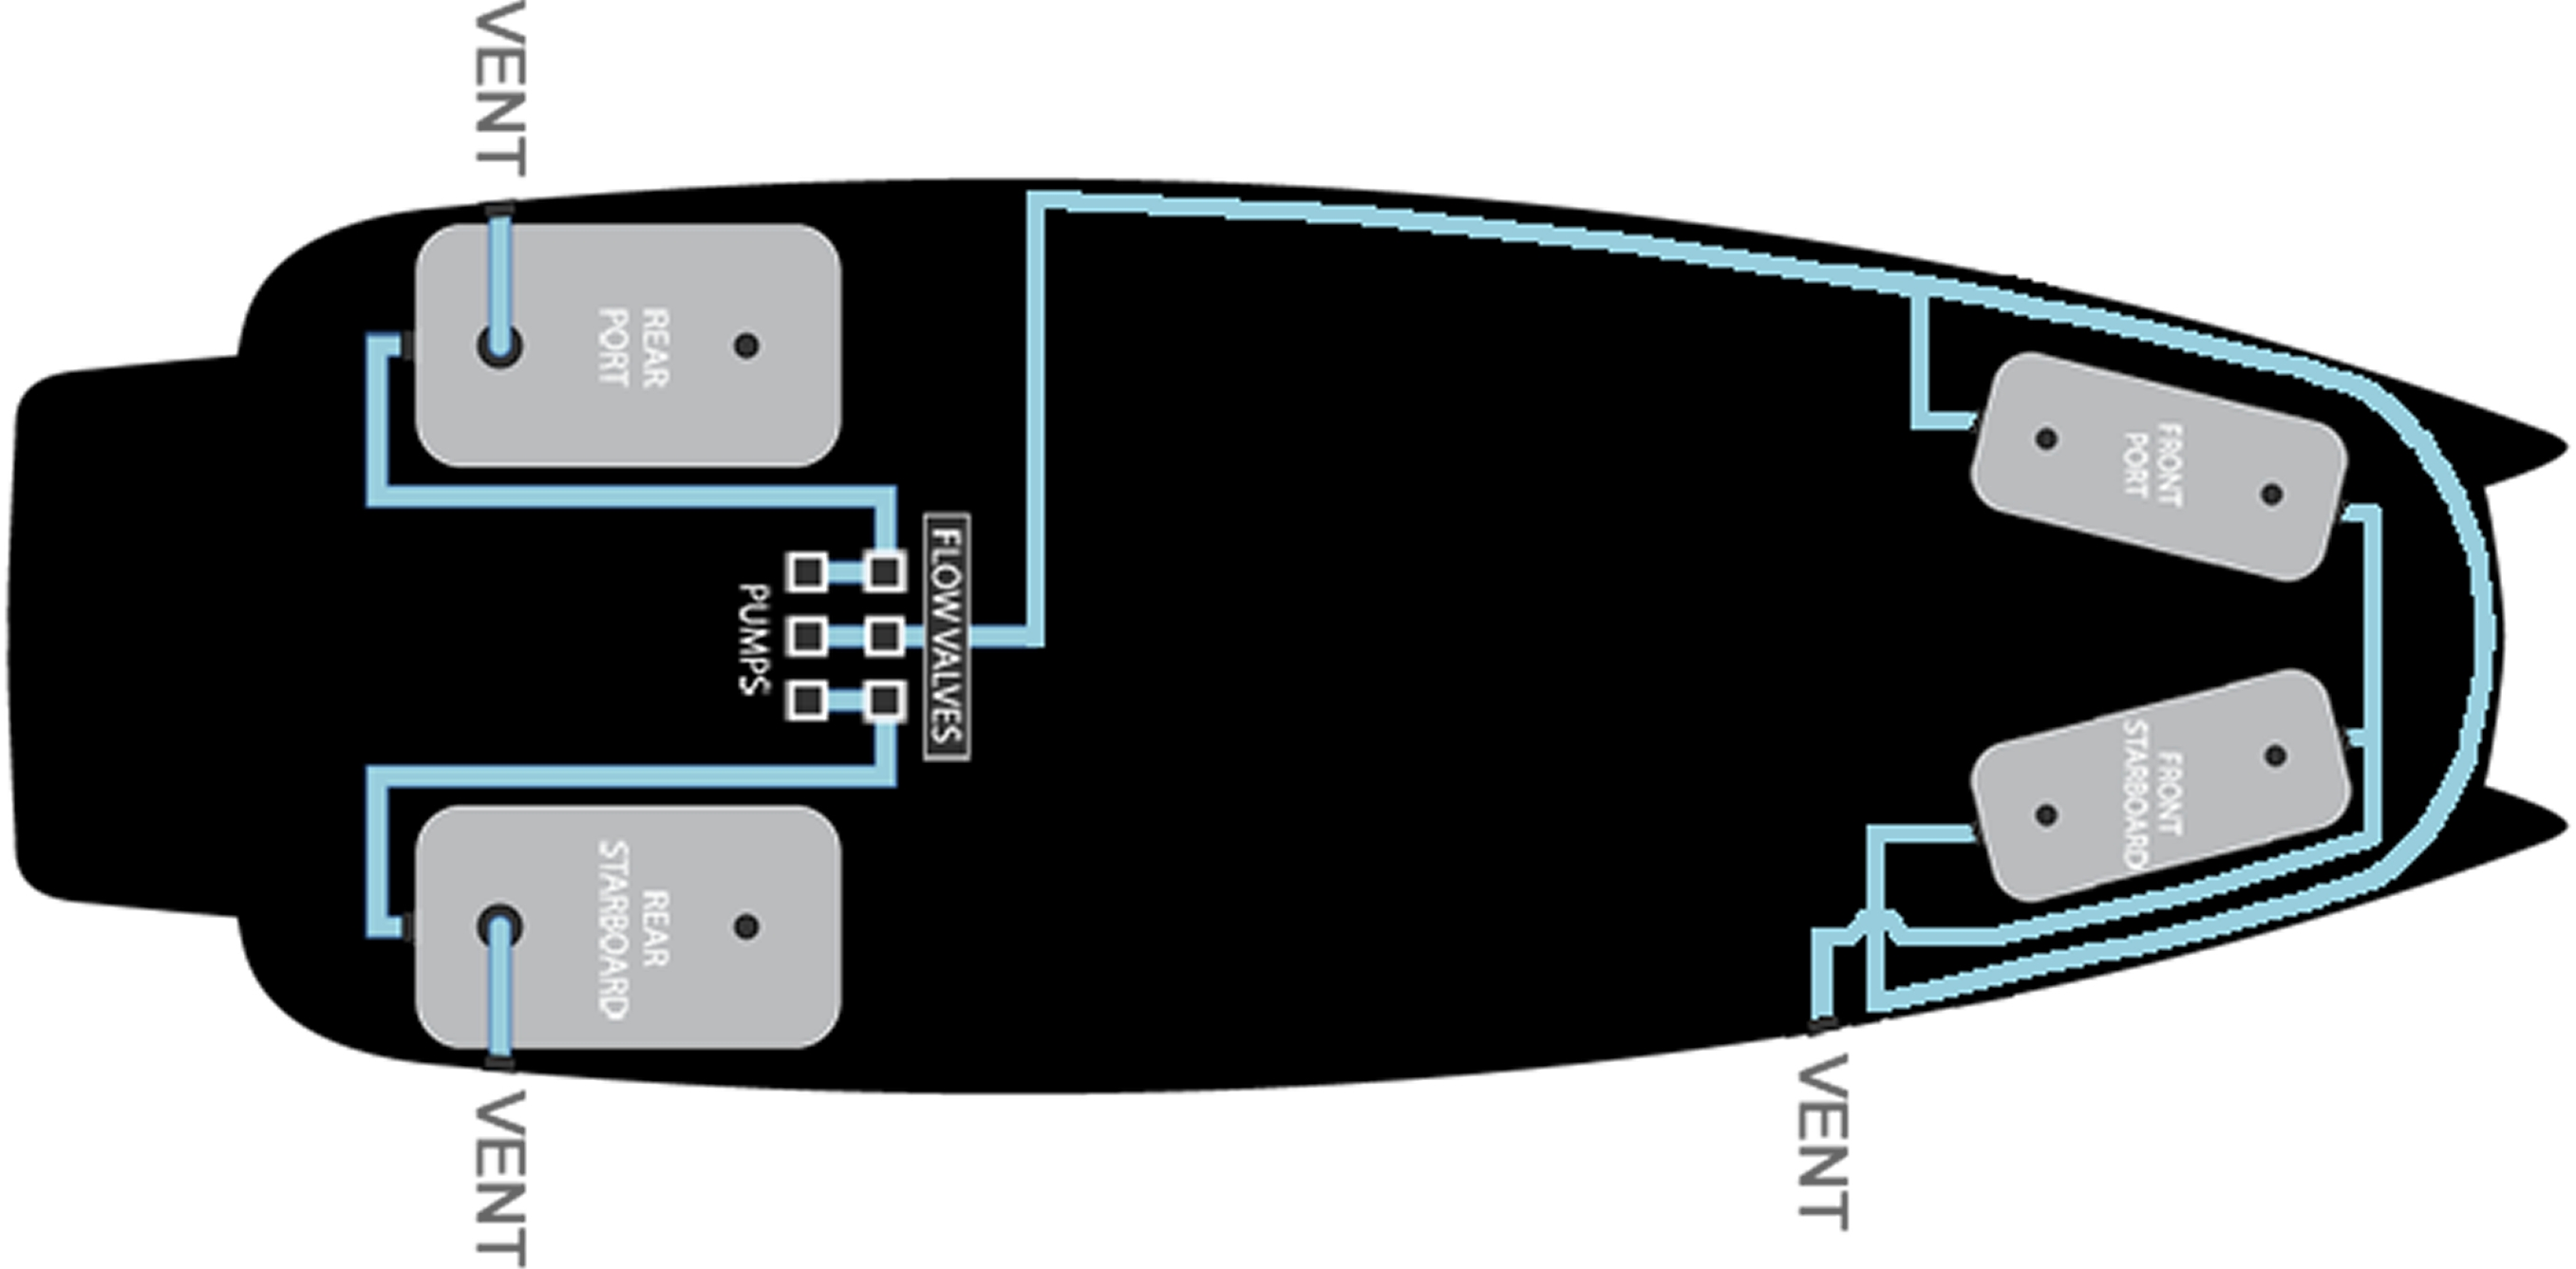 mastercraft x star ballast system mastercraft ballast system complete x star ballast system